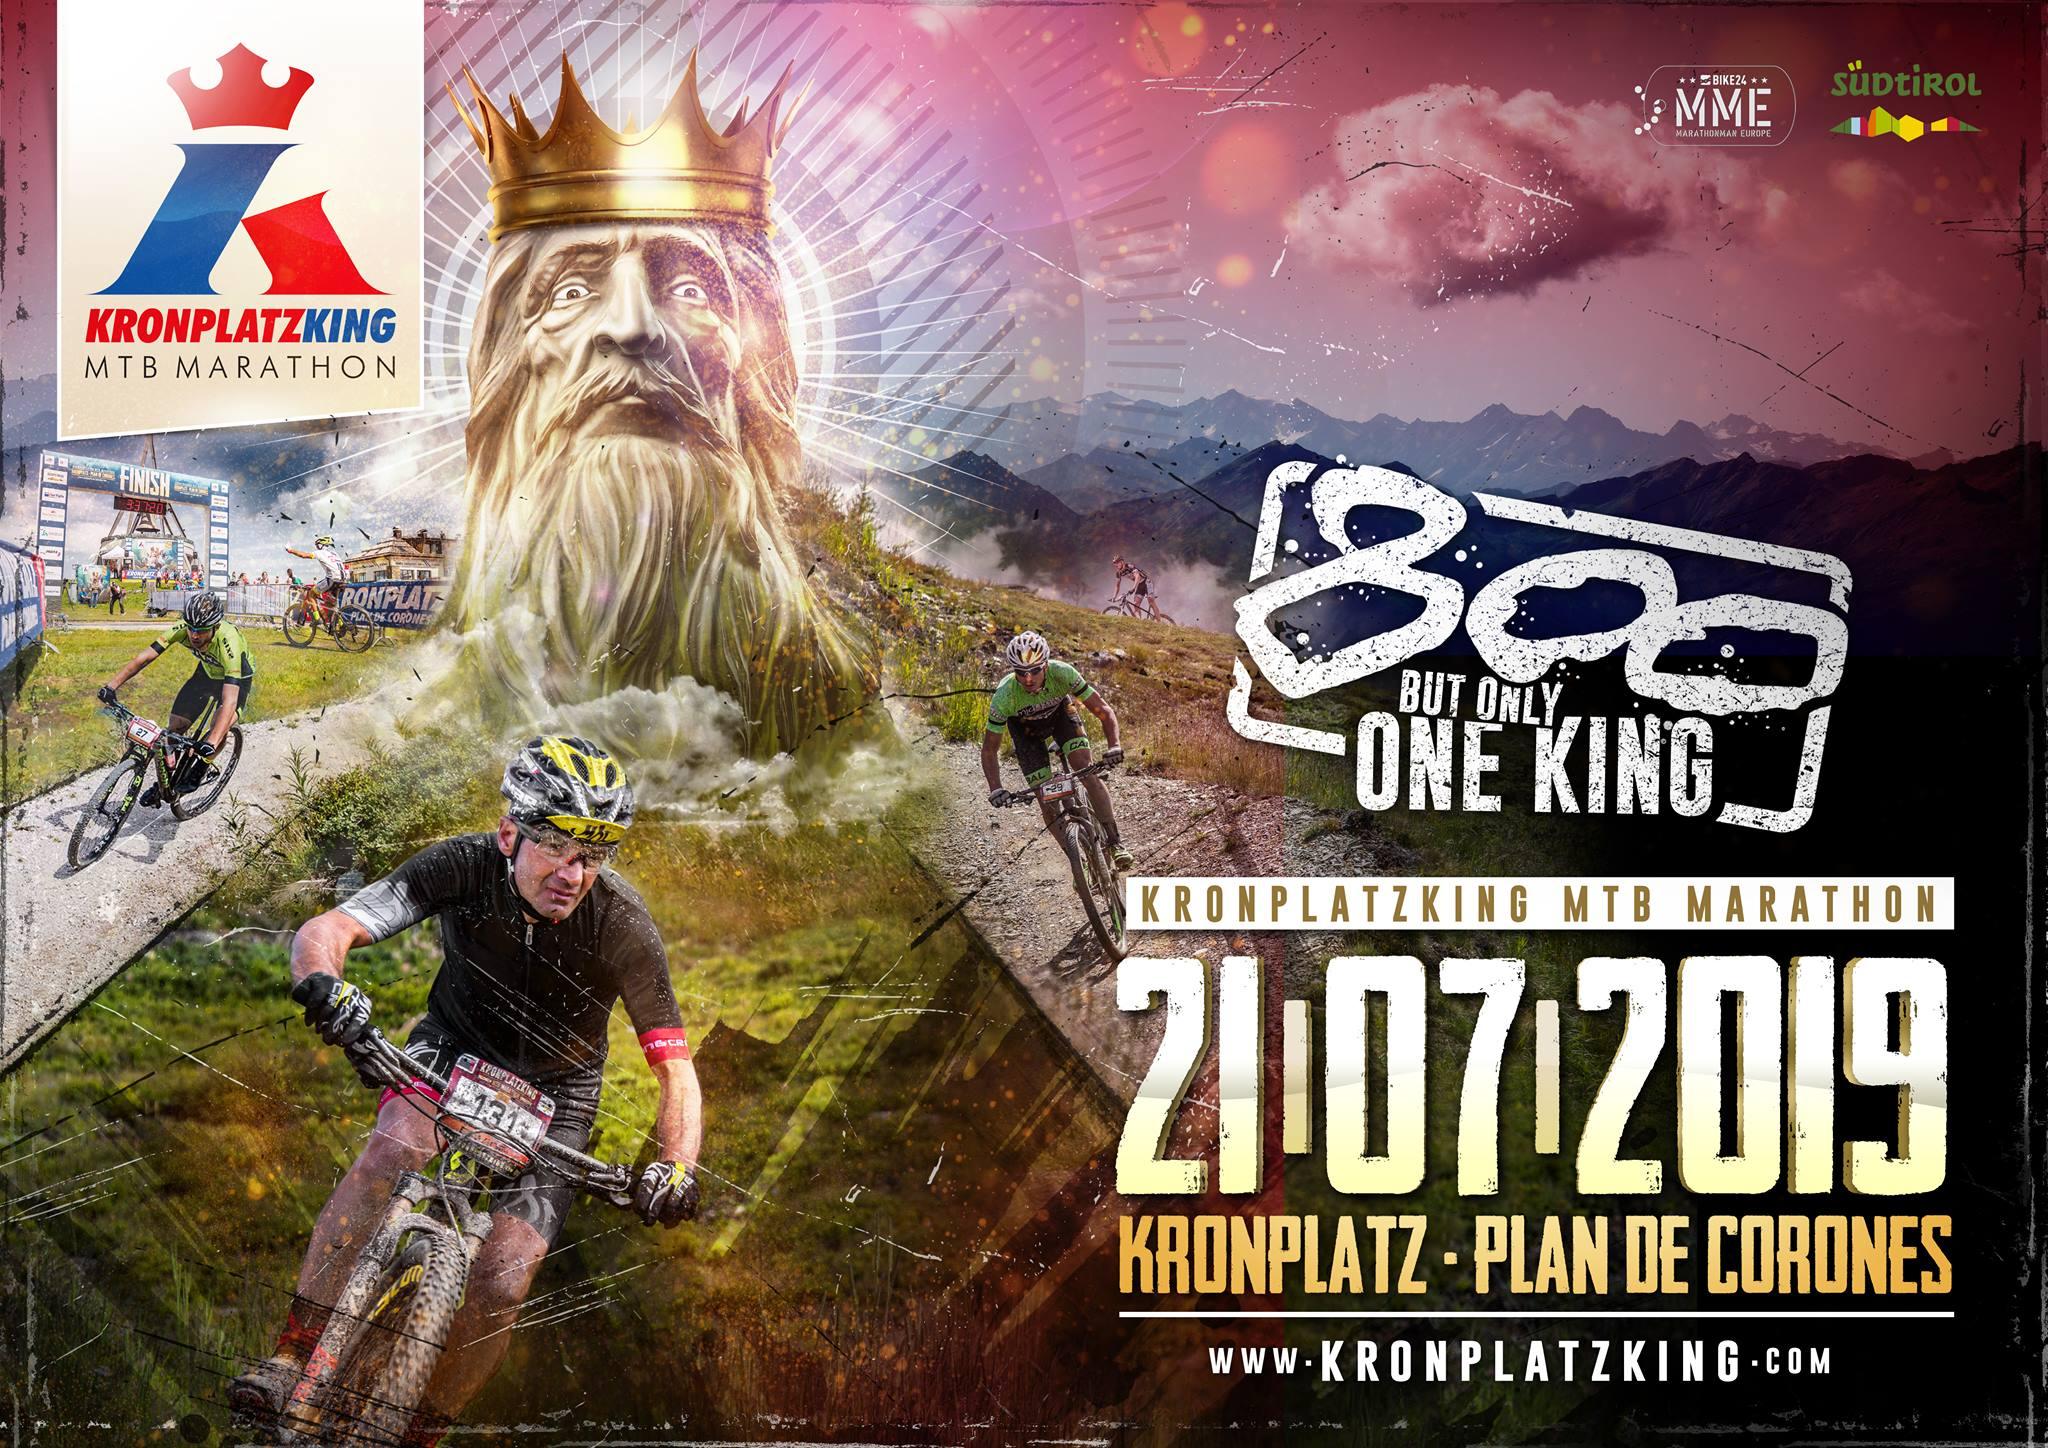 KronplatzKing MTB Marathon